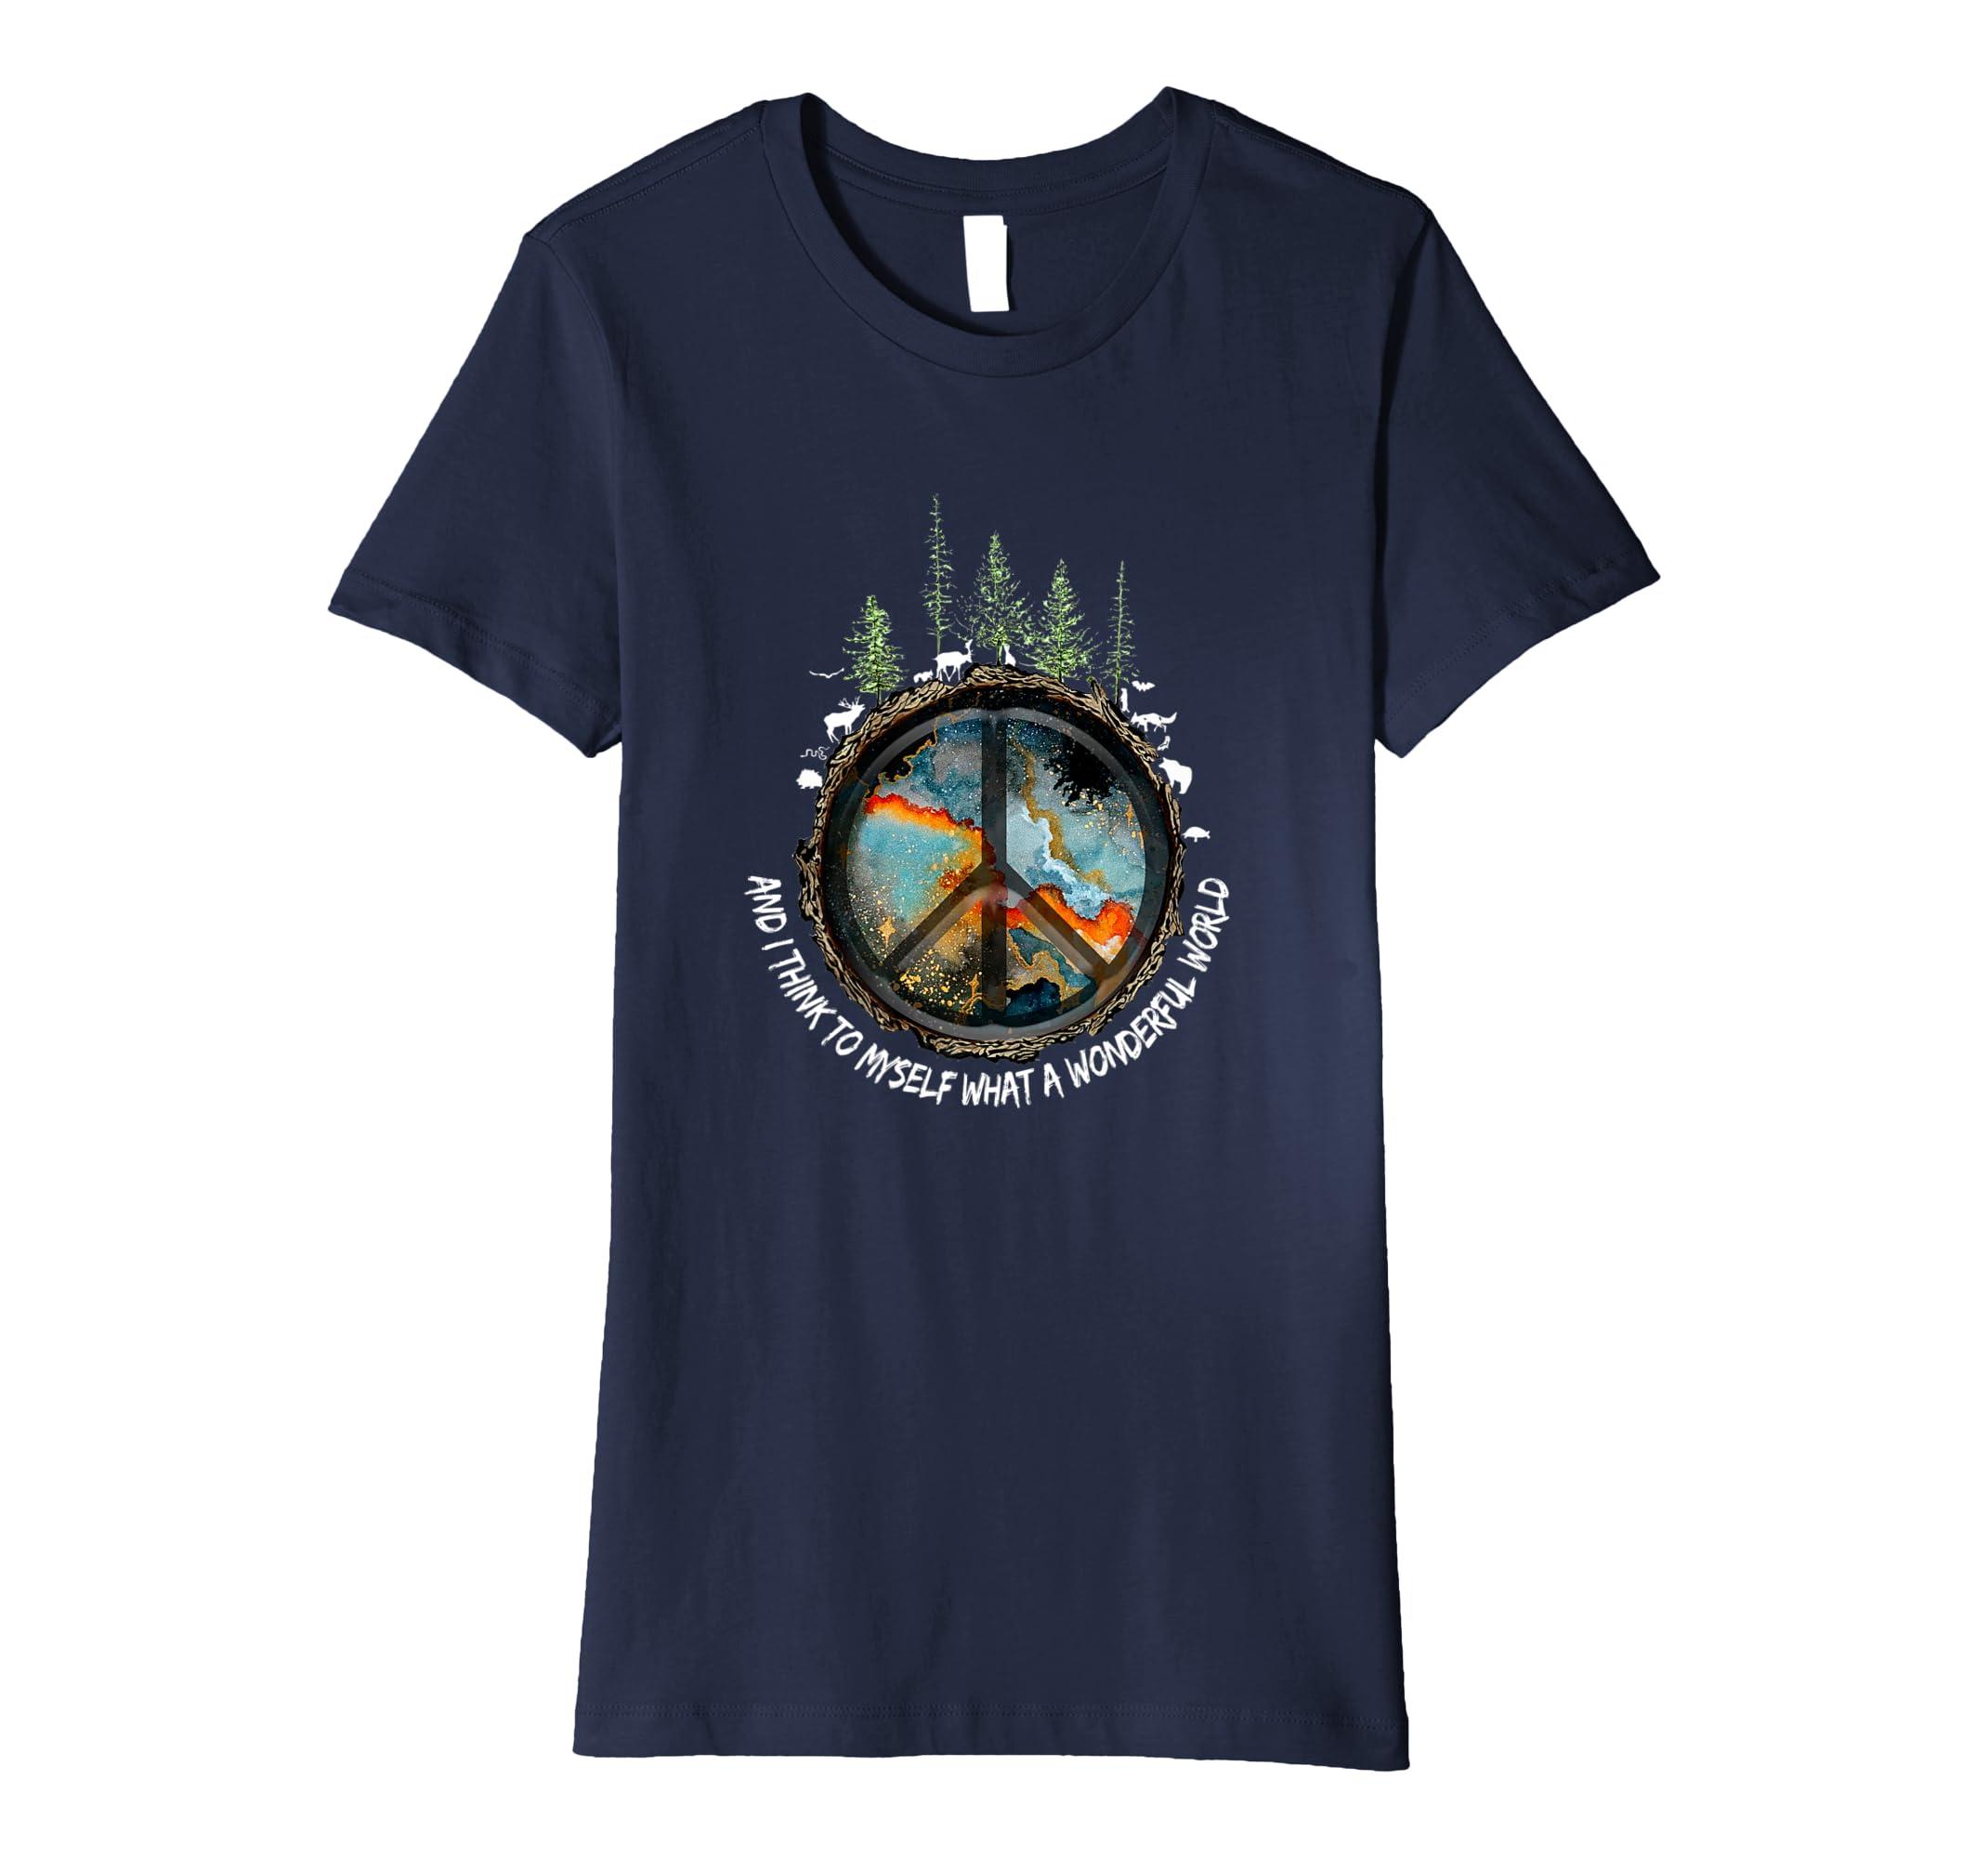 53f6ef8fcda Amazon.com  And I Think To Myself What A Wonderful World Hippie T-Shirt   Clothing